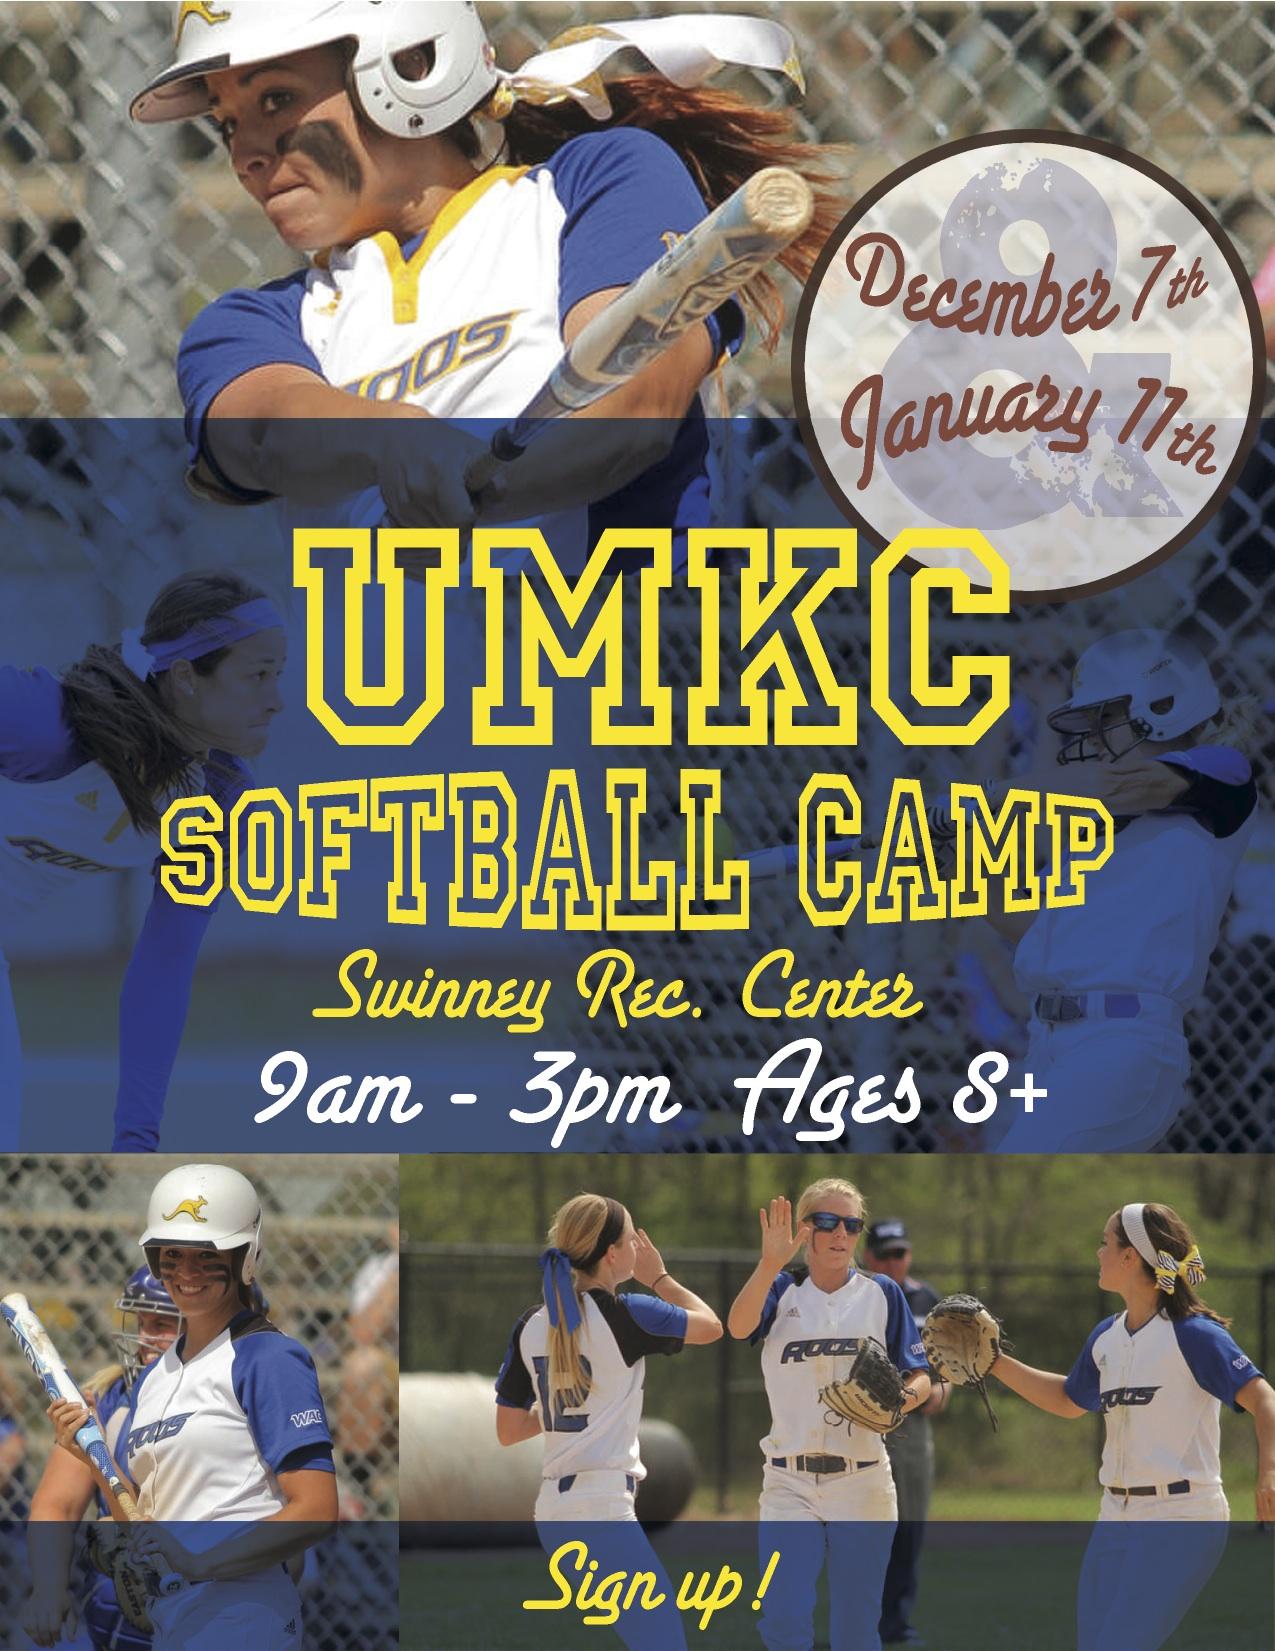 UMKC Softball Camp 2014.jpg